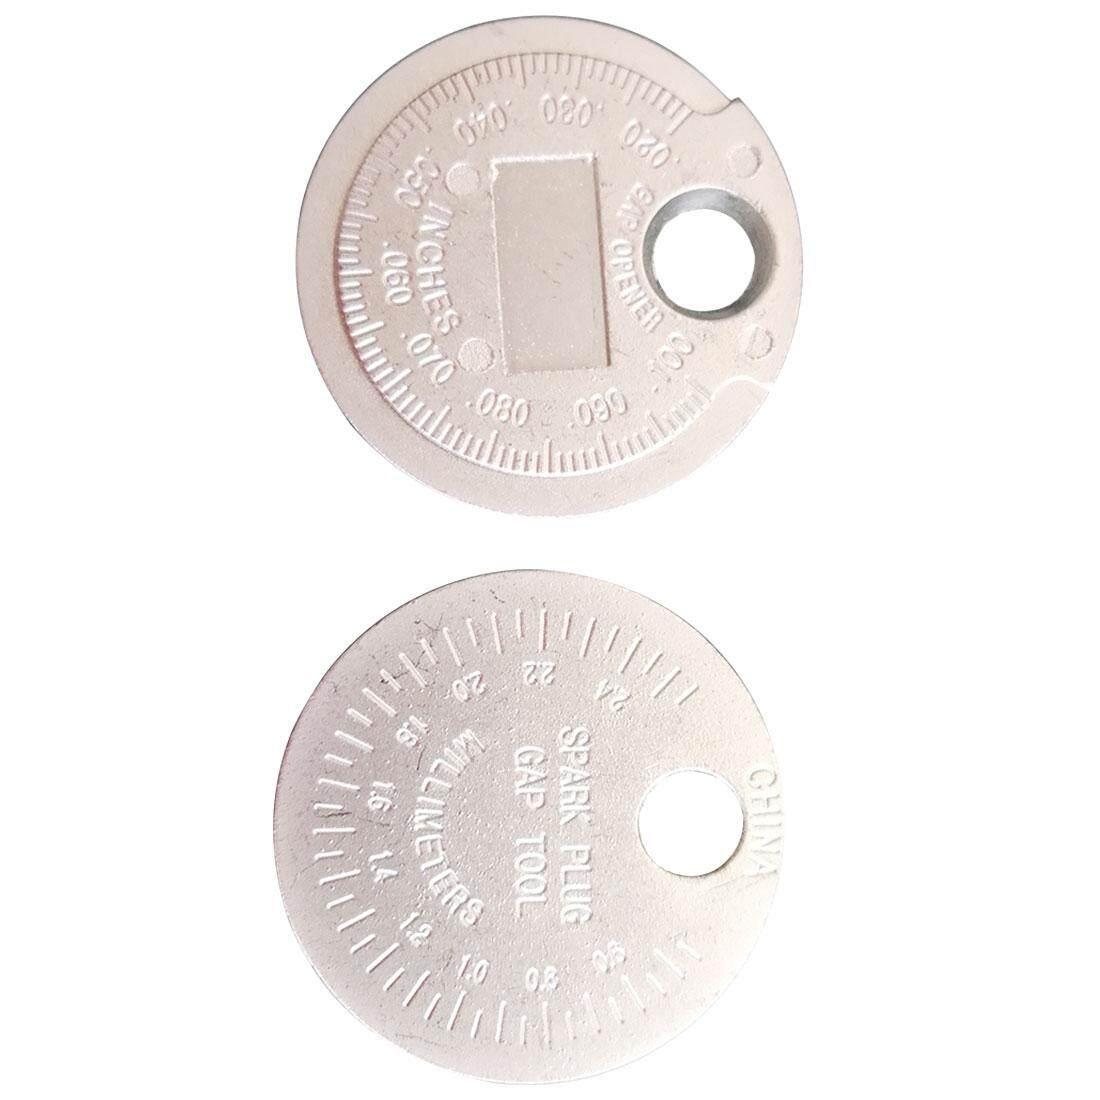 Spark Plug Gap Gauge Tool Measurement Coin-Type 0 6-2 4mm Range Spark Plug  Gage